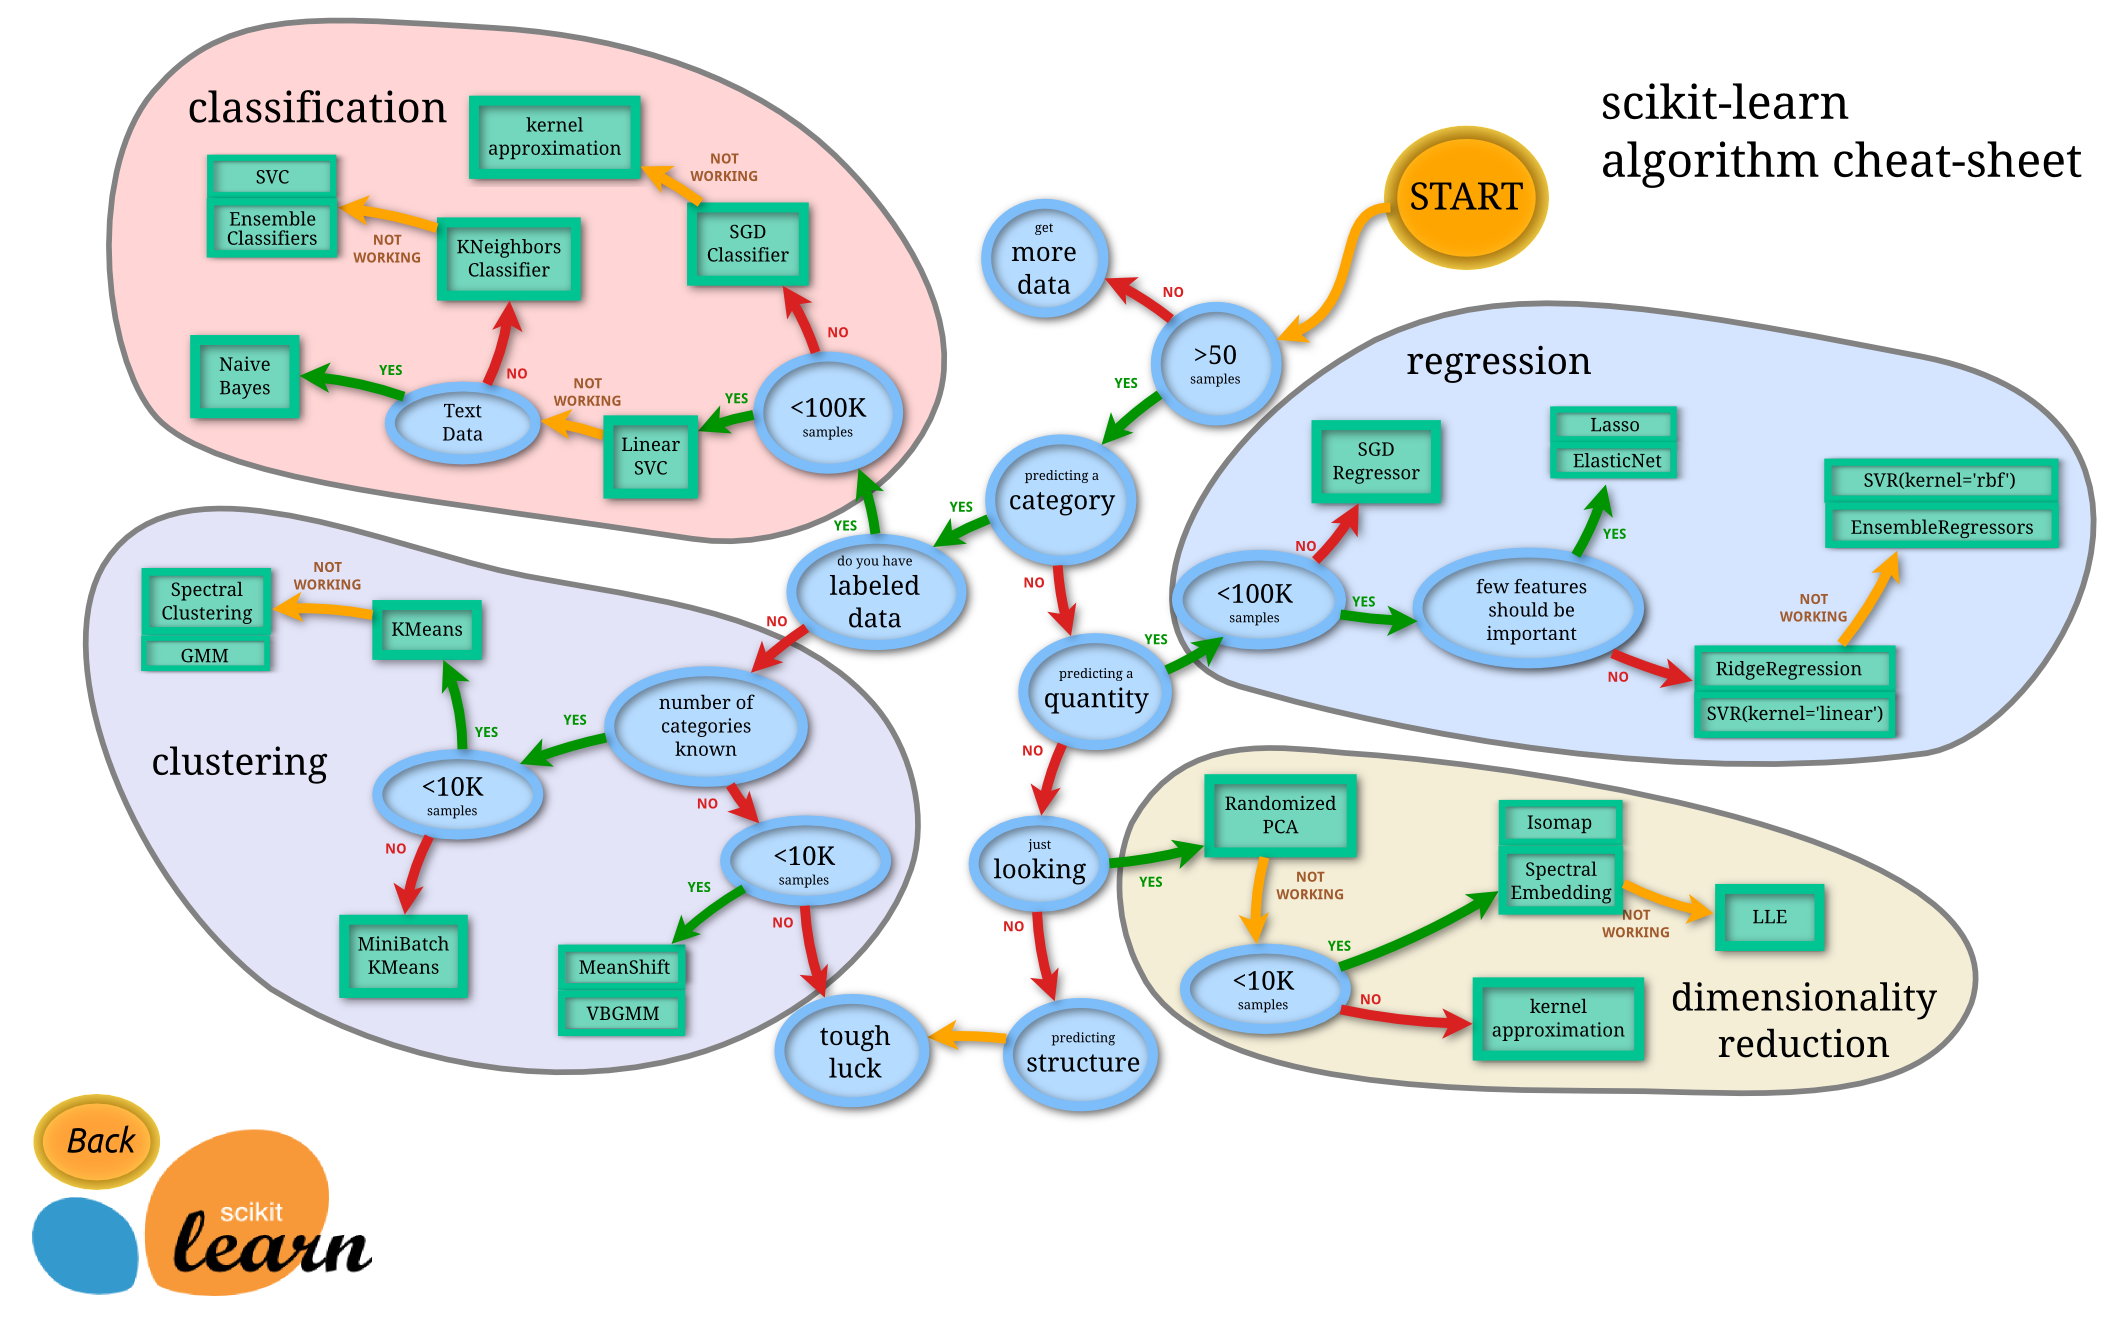 scikit-learn algorithm cheat-sheet